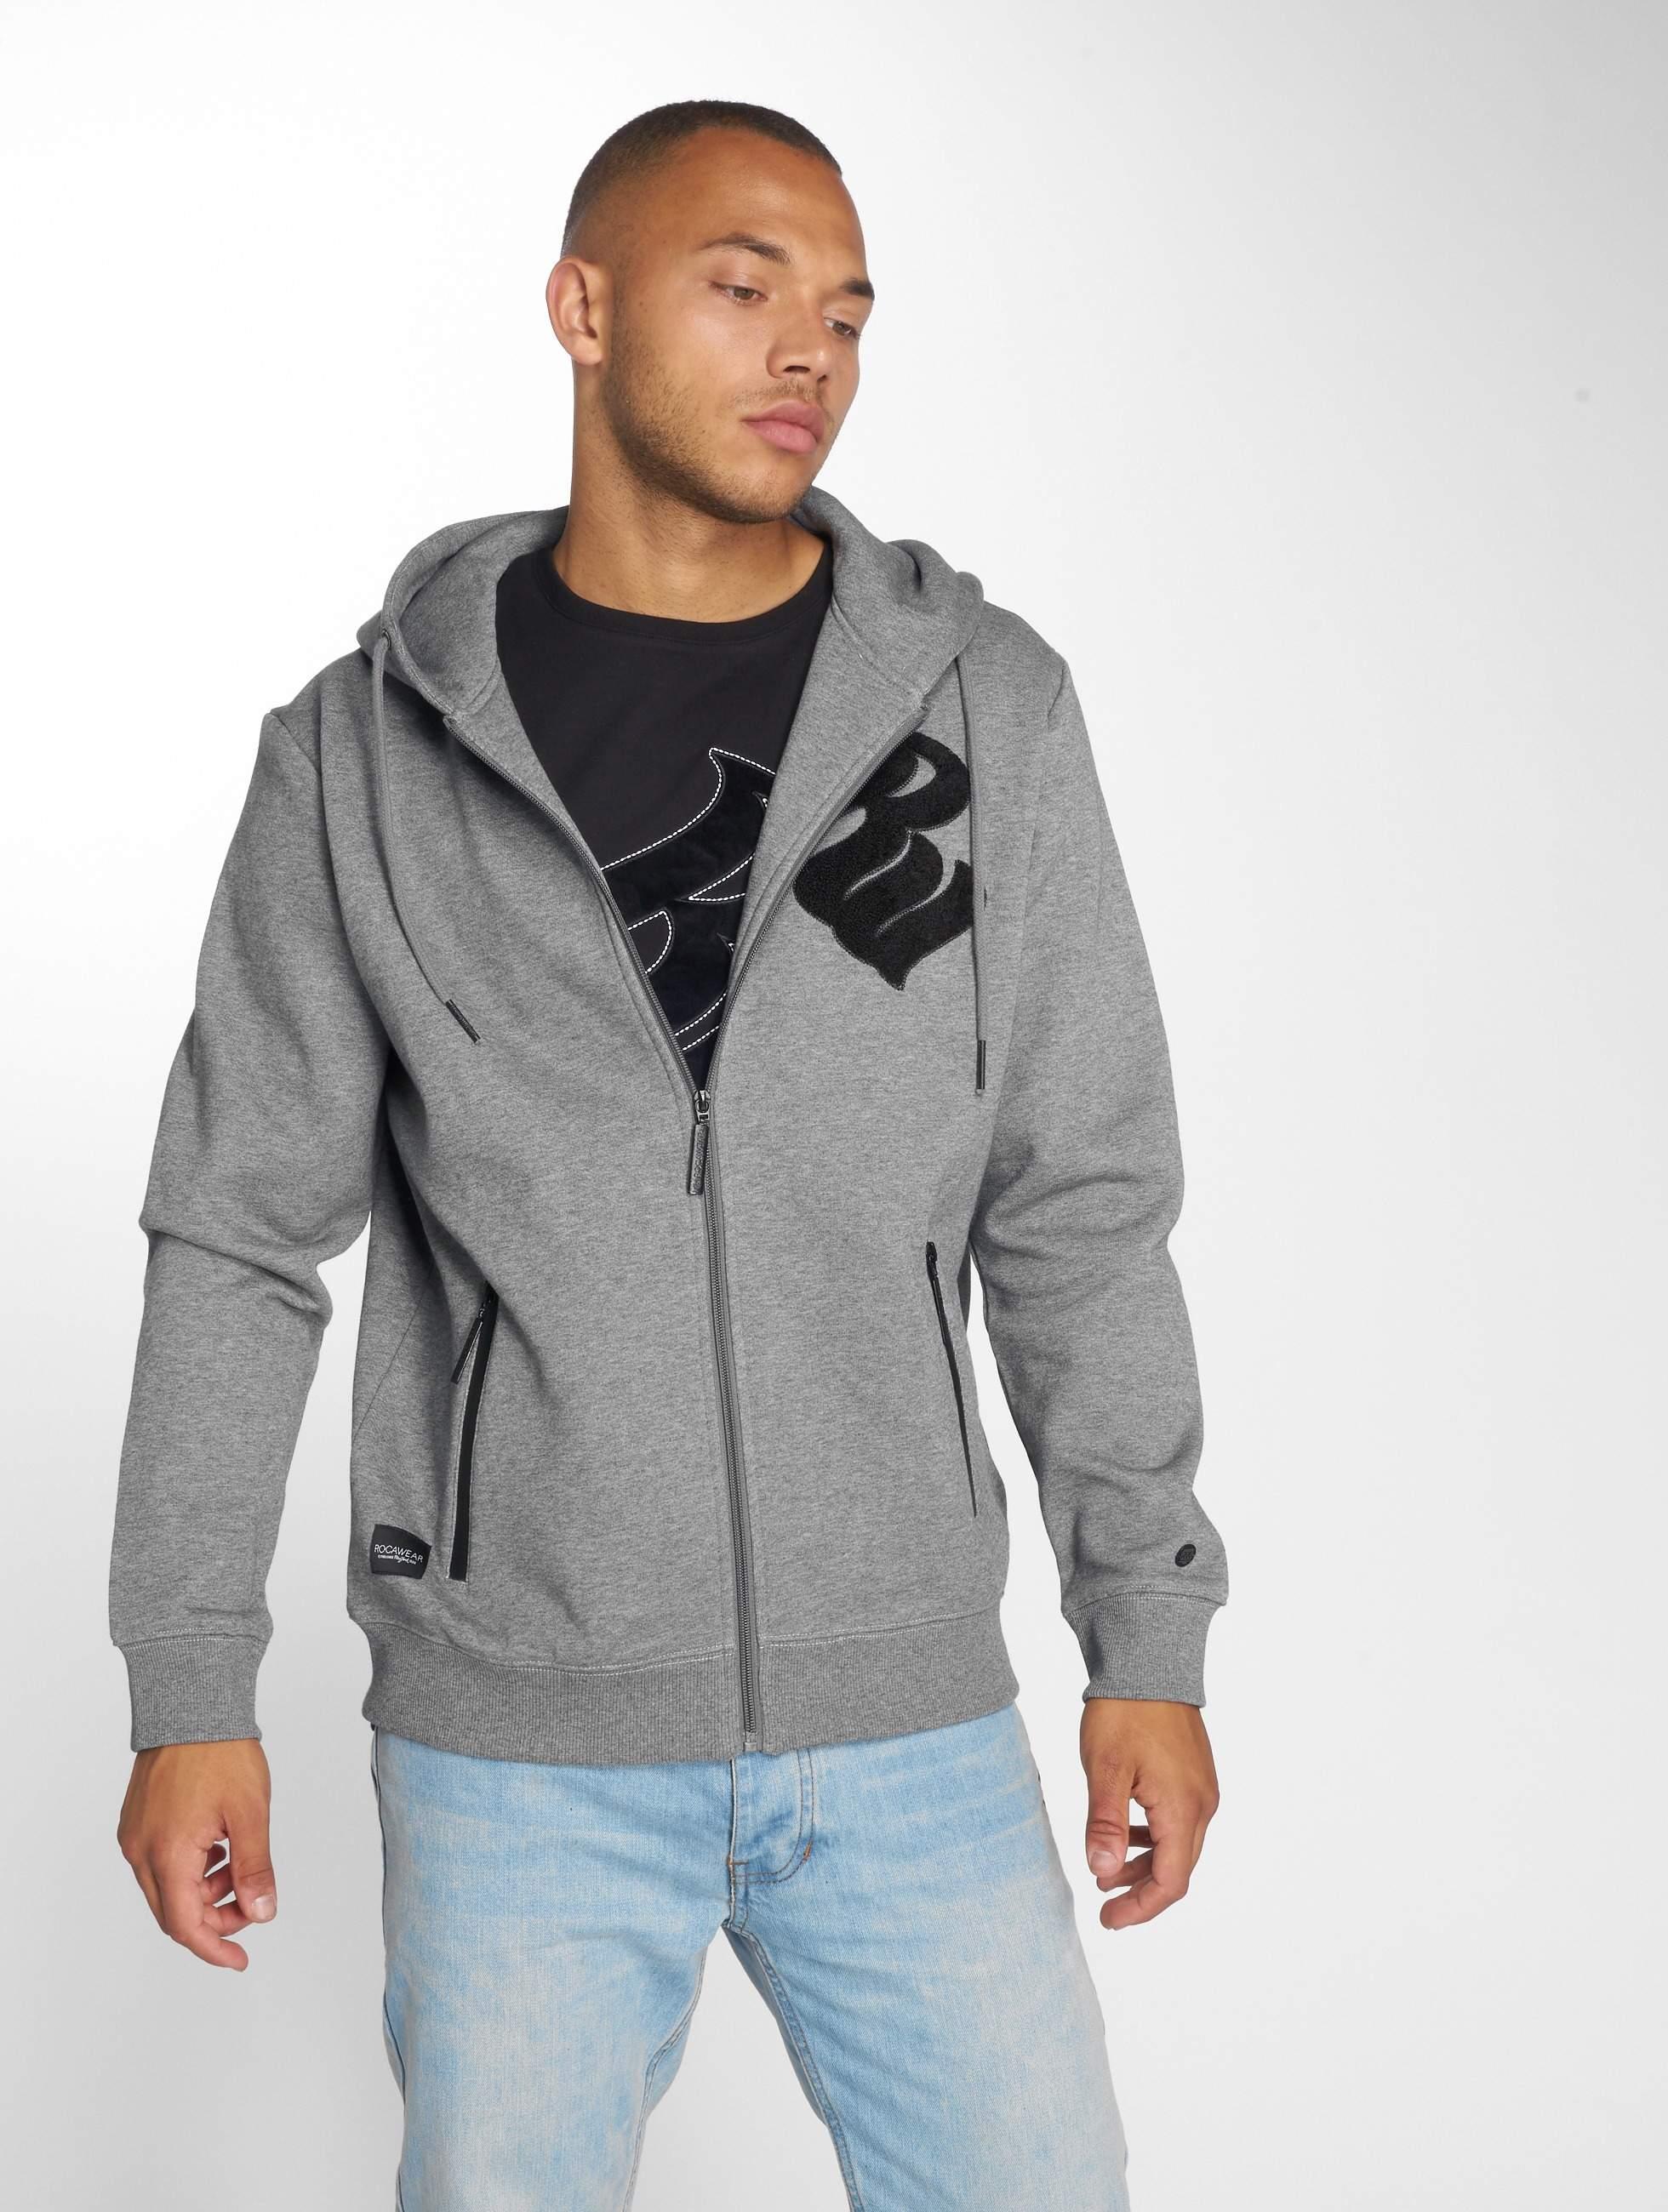 Rocawear / Zip Hoodie Logo in grey XL